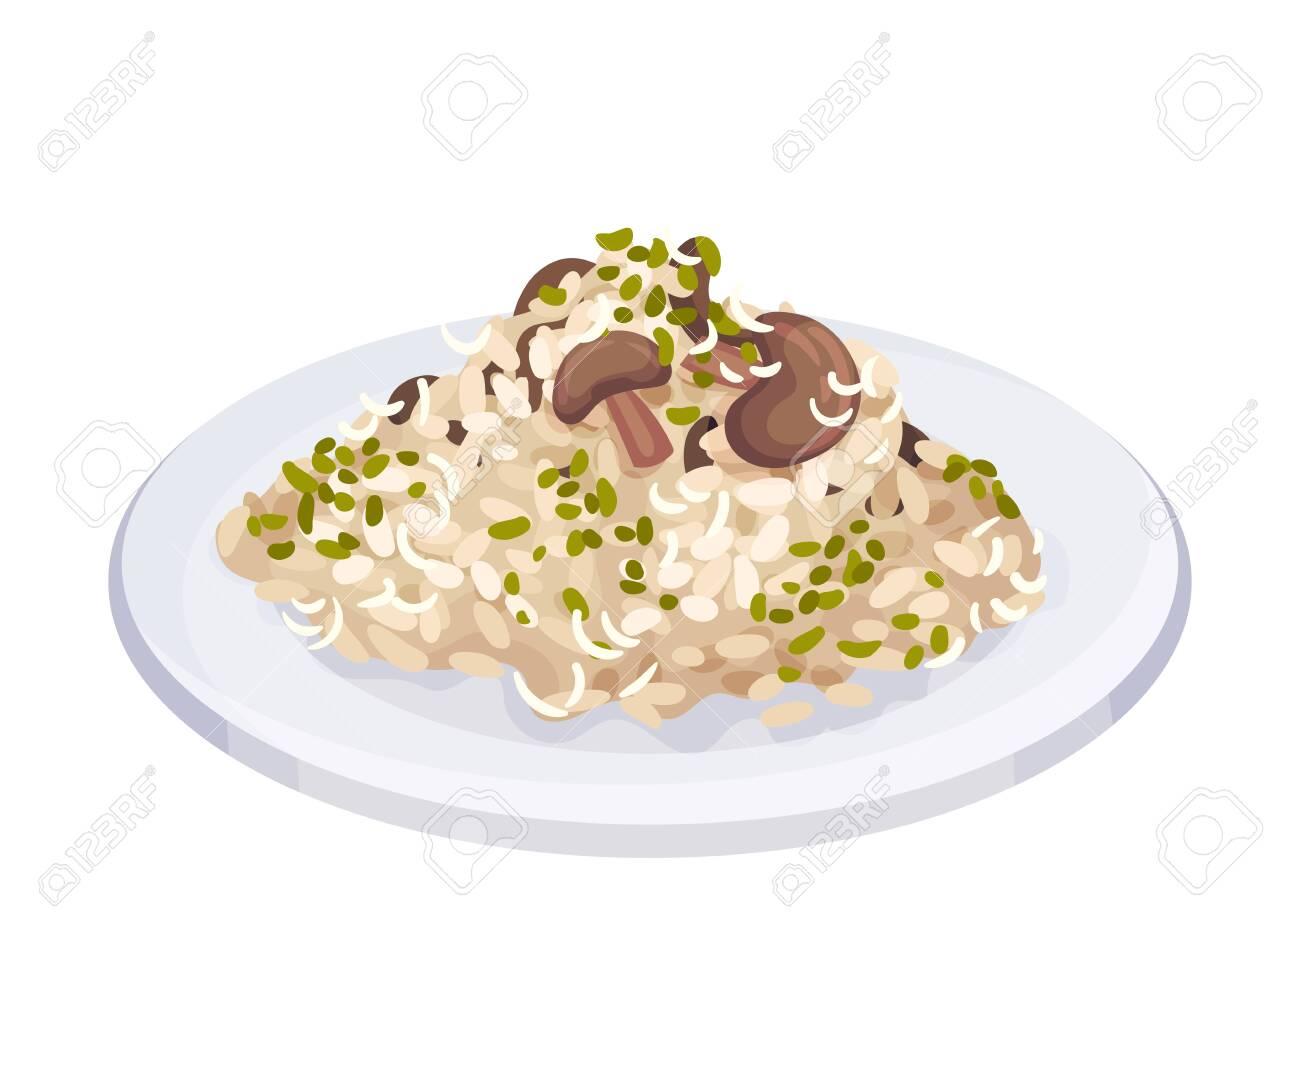 Mushroom Risotto, Traditional Italian Cuisine Food Dish Vector Illustration - 137061059